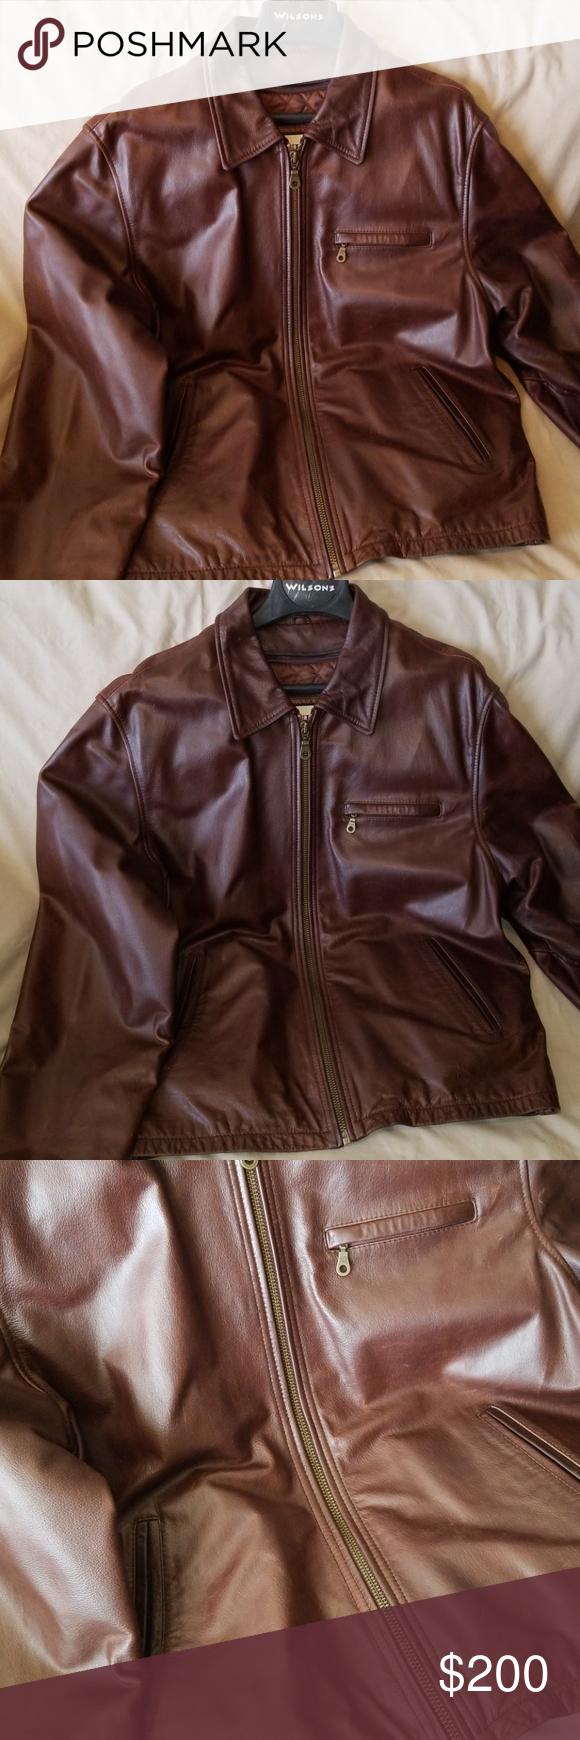 Vintage Wilsons Leather Jacket Leather jacket, Wilsons